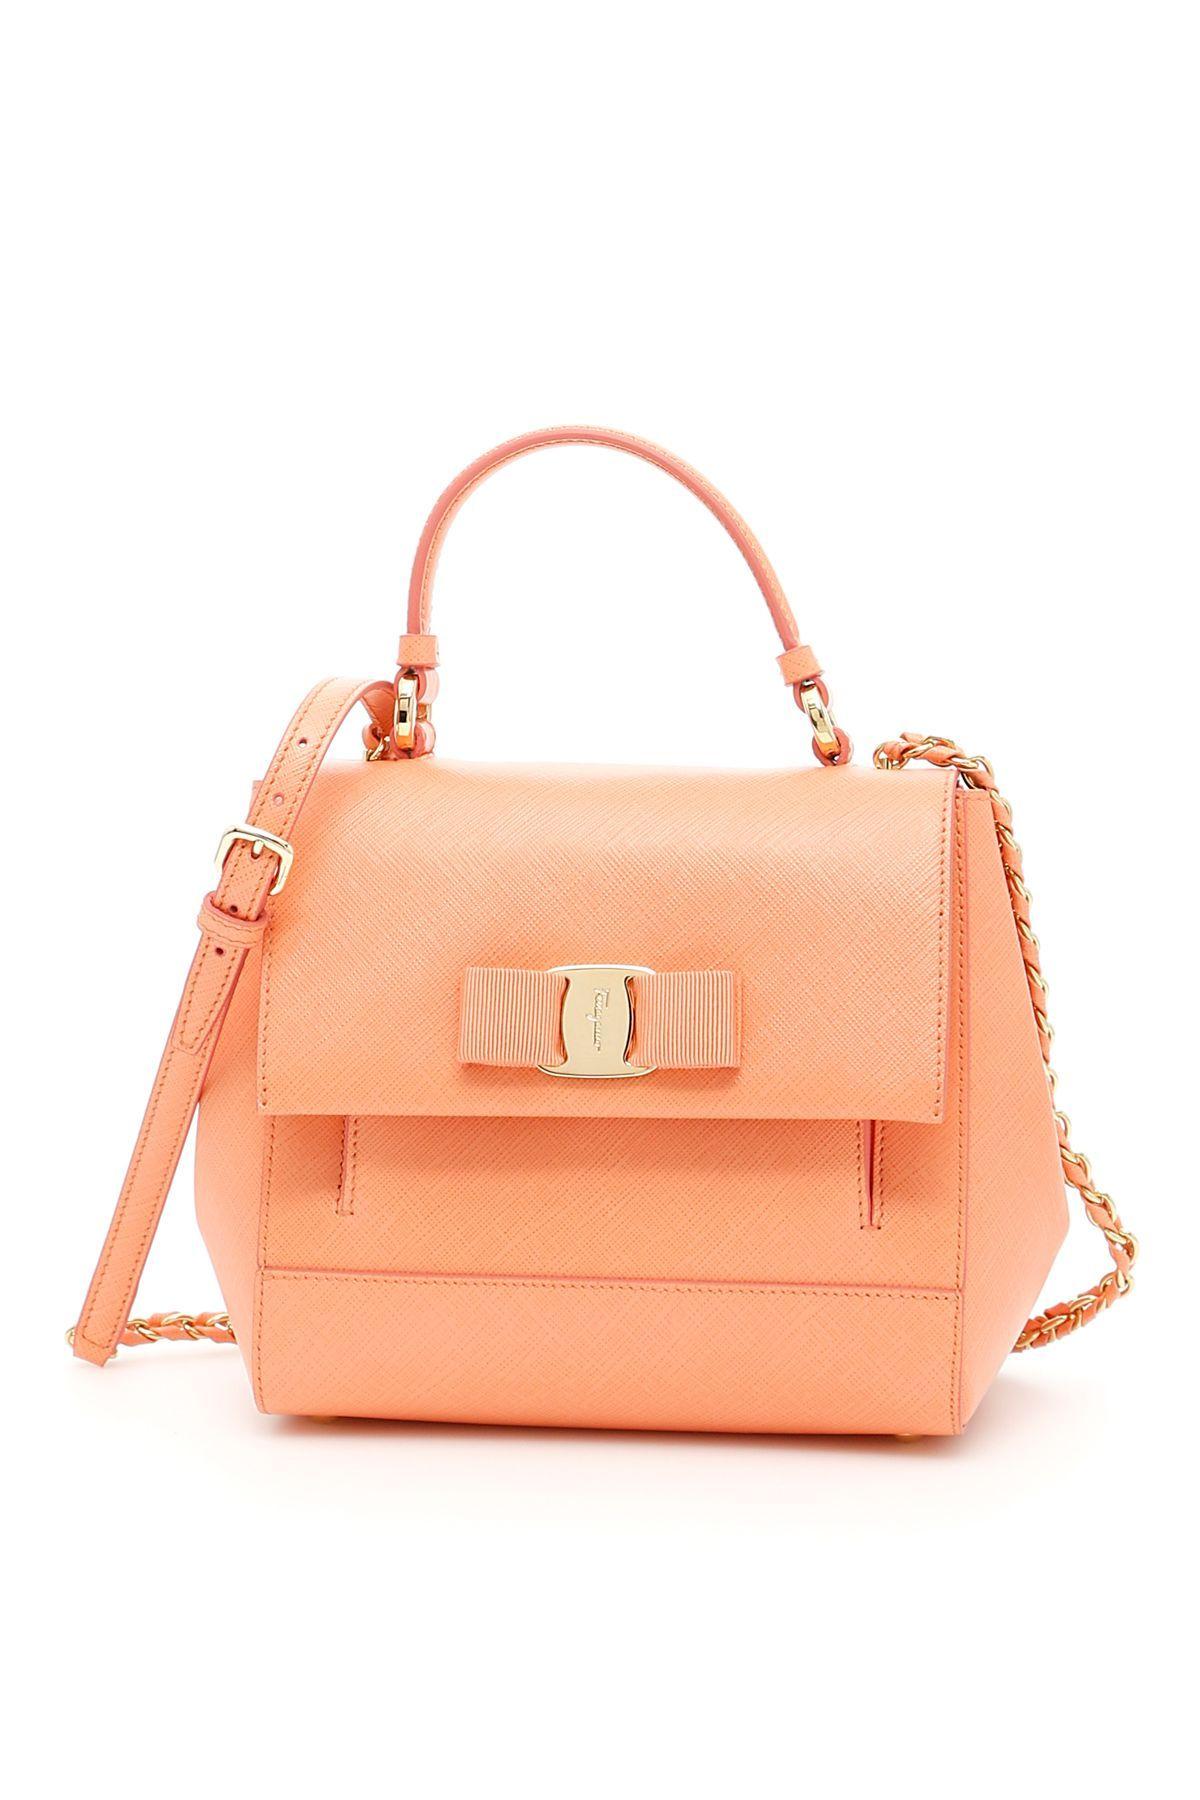 1499eace7057 SALVATORE FERRAGAMO SAFFIANO CARRIE BAG.  salvatoreferragamo  bags  shoulder  bags  leather  lining